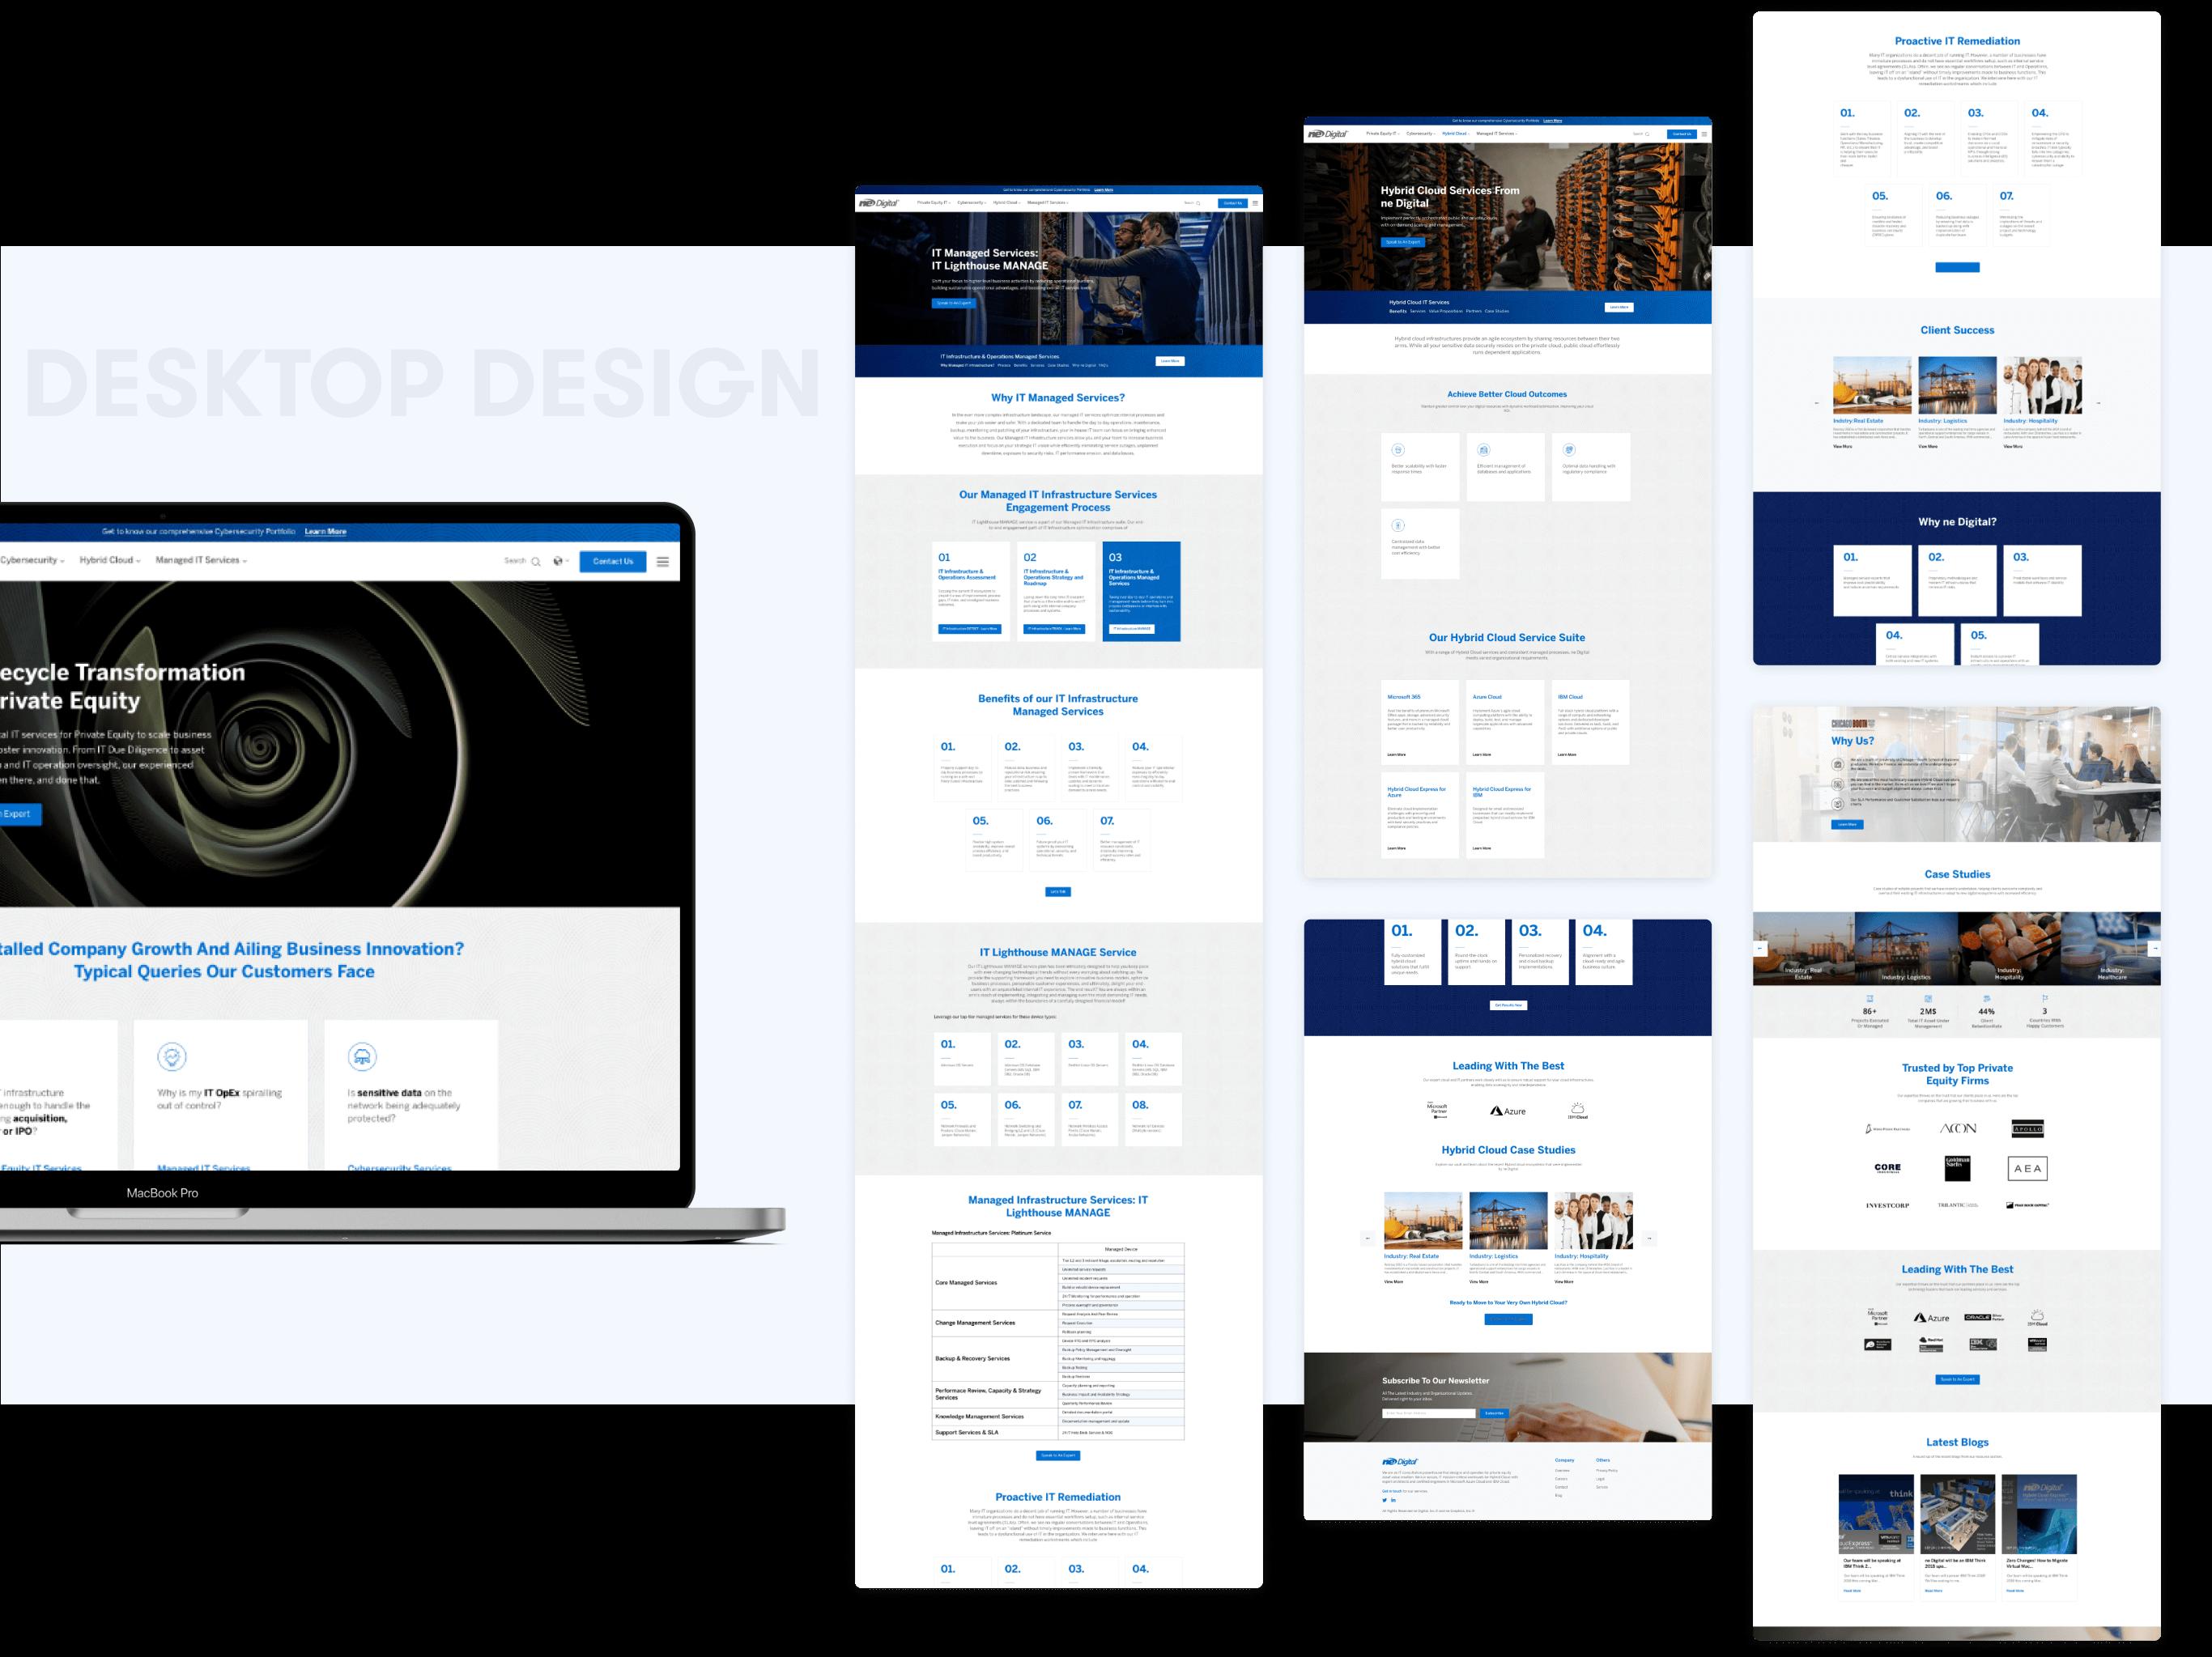 neDigital | Design and Development by wow.design